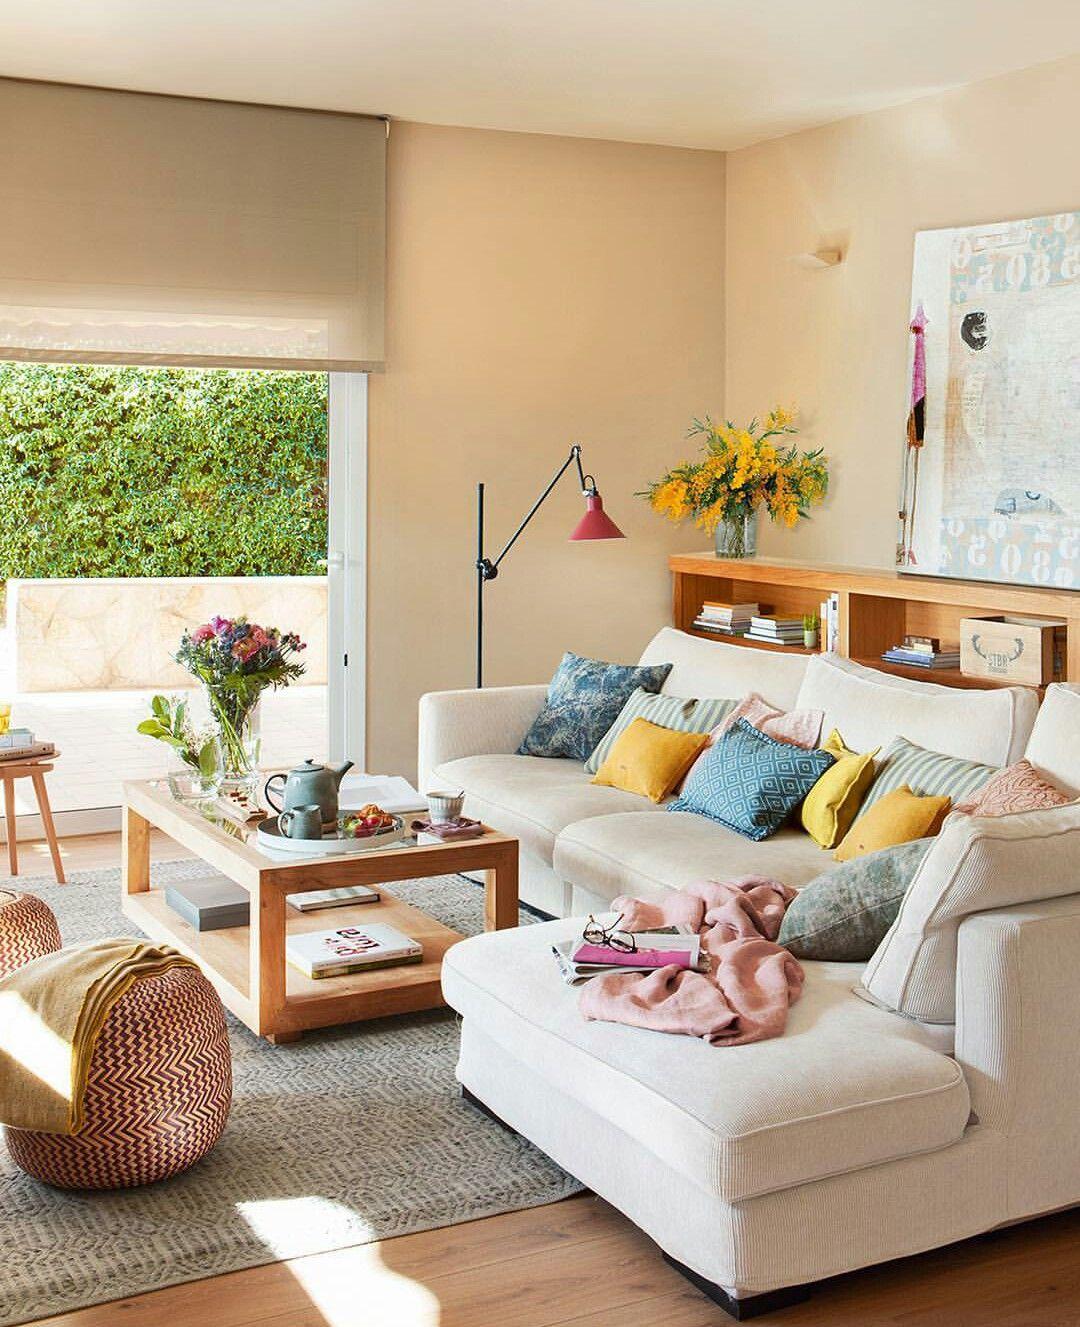 33 Beige Living Room Ideas: Living Room Decor, Beige Sofa